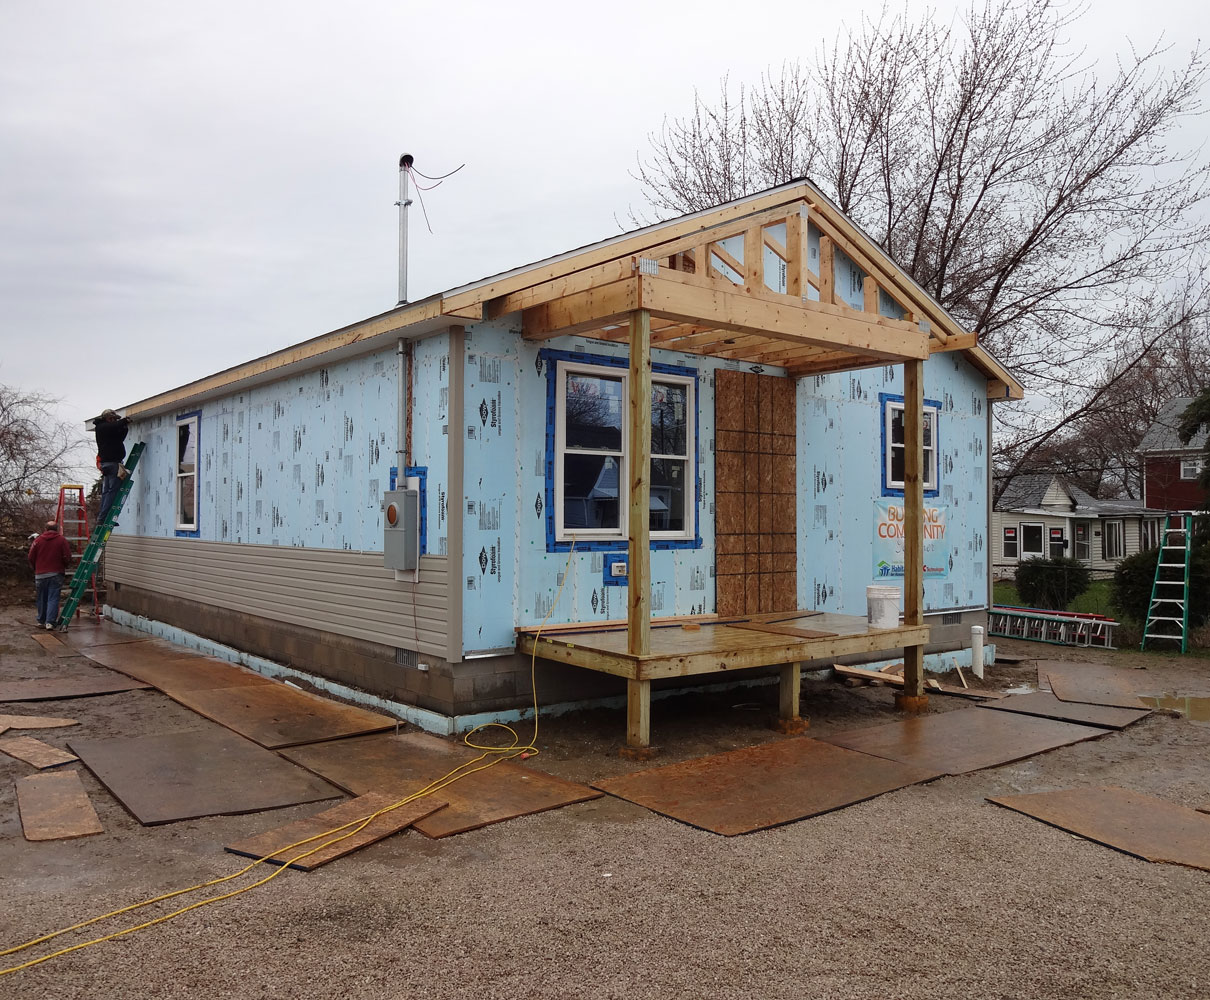 Unfinished Habitat for Humanity house